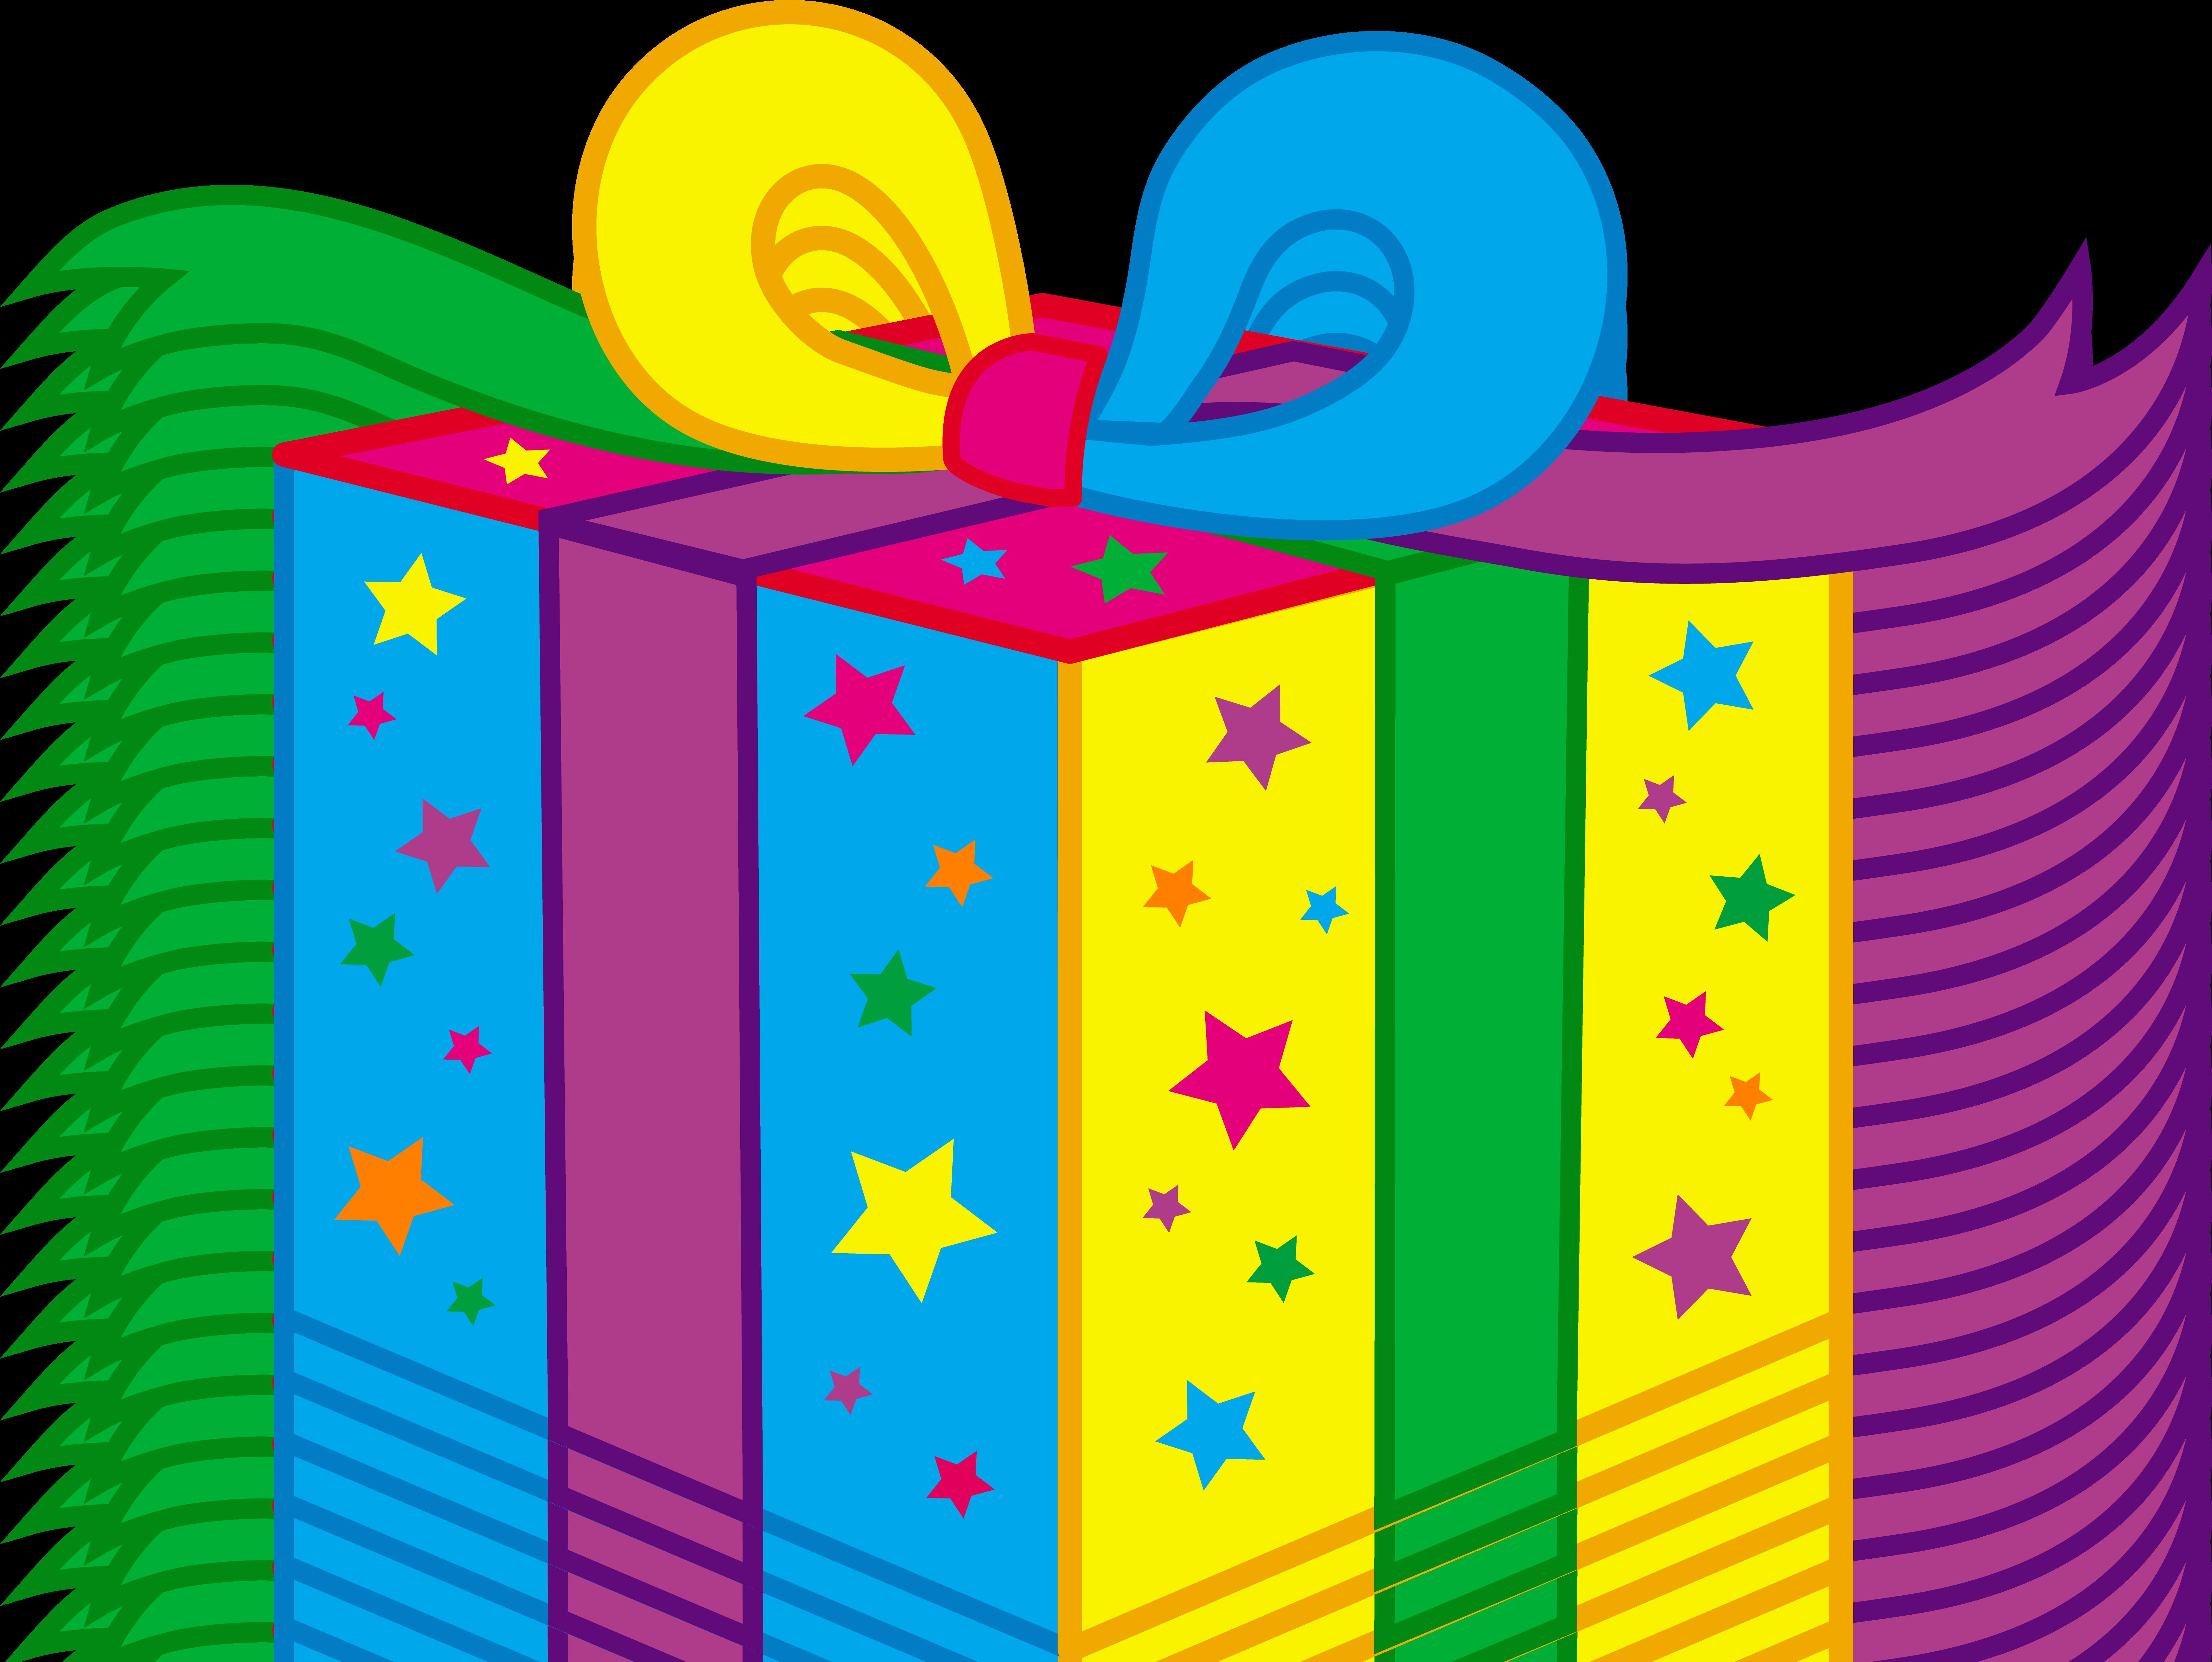 birthday clipart u0026middot; birthday c-birthday clipart u0026middot; birthday clipart free u0026middot; gift clipart-1